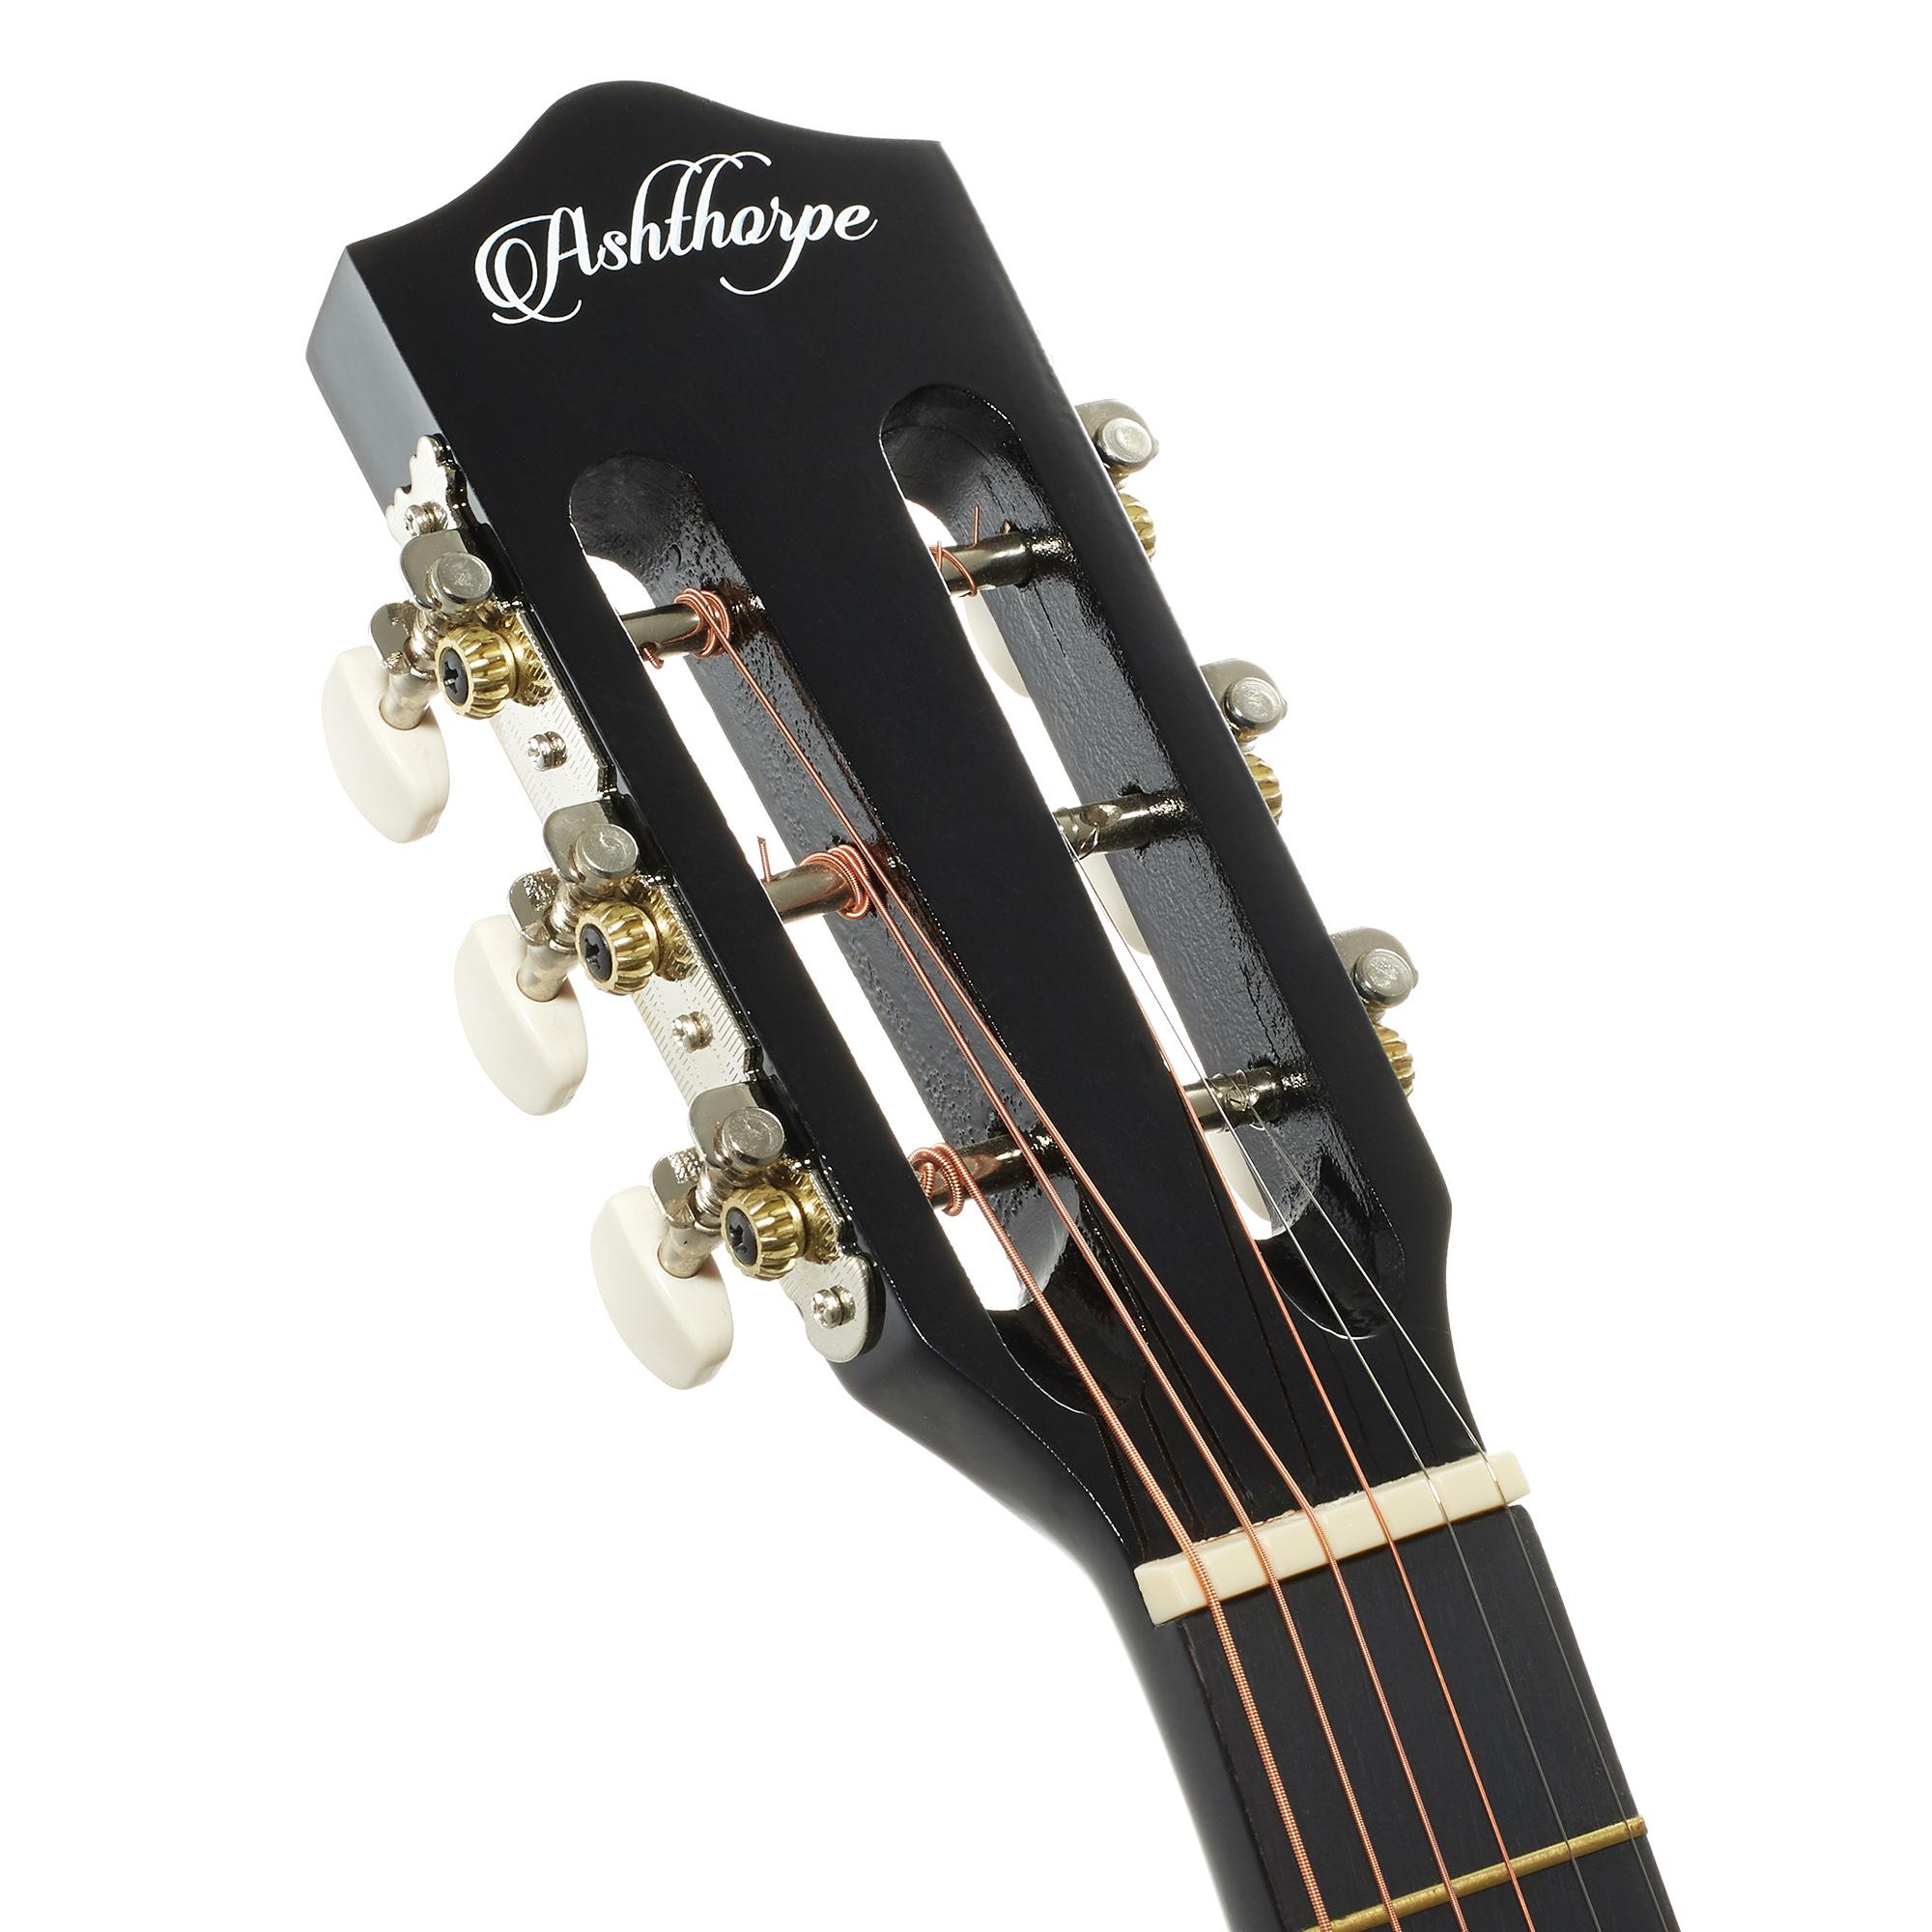 Image 34 - 38-inch Beginner Acoustic Guitar Package, Kids Starter Bundle Kit & Accessories